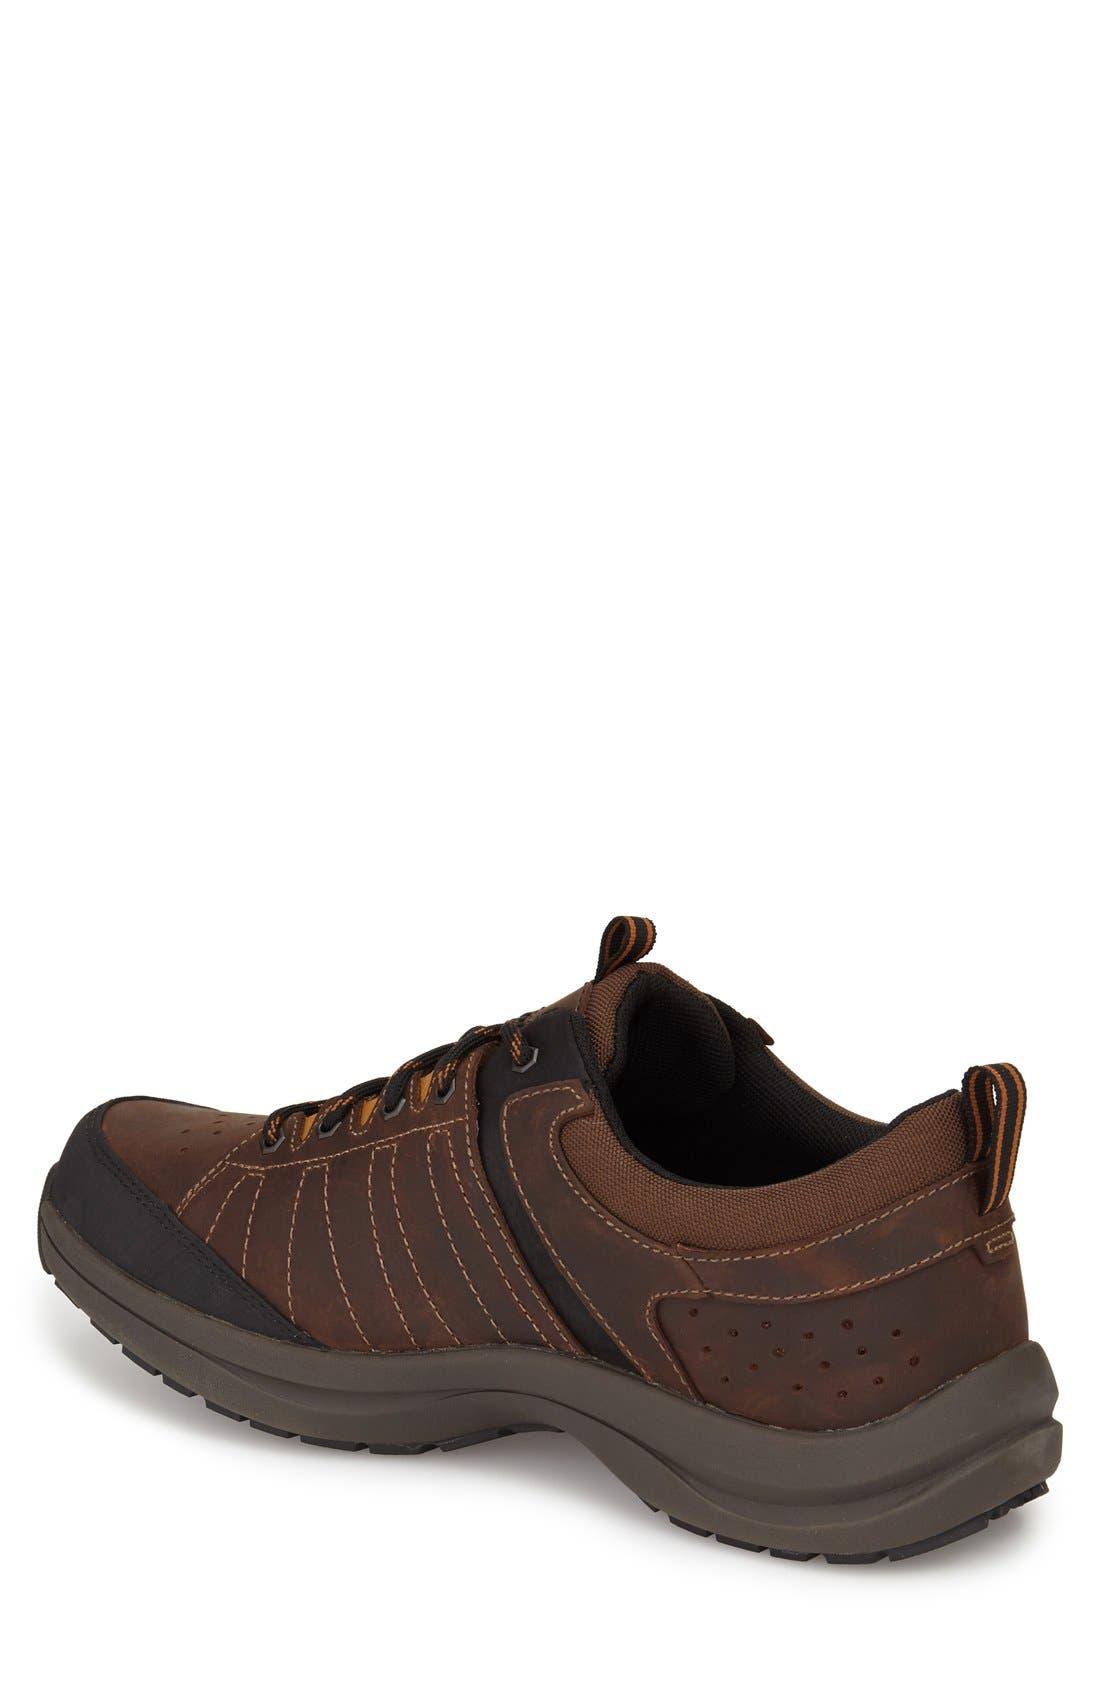 Seth-Dun Waterproof Sneaker,                             Alternate thumbnail 2, color,                             BROWN LEATHER